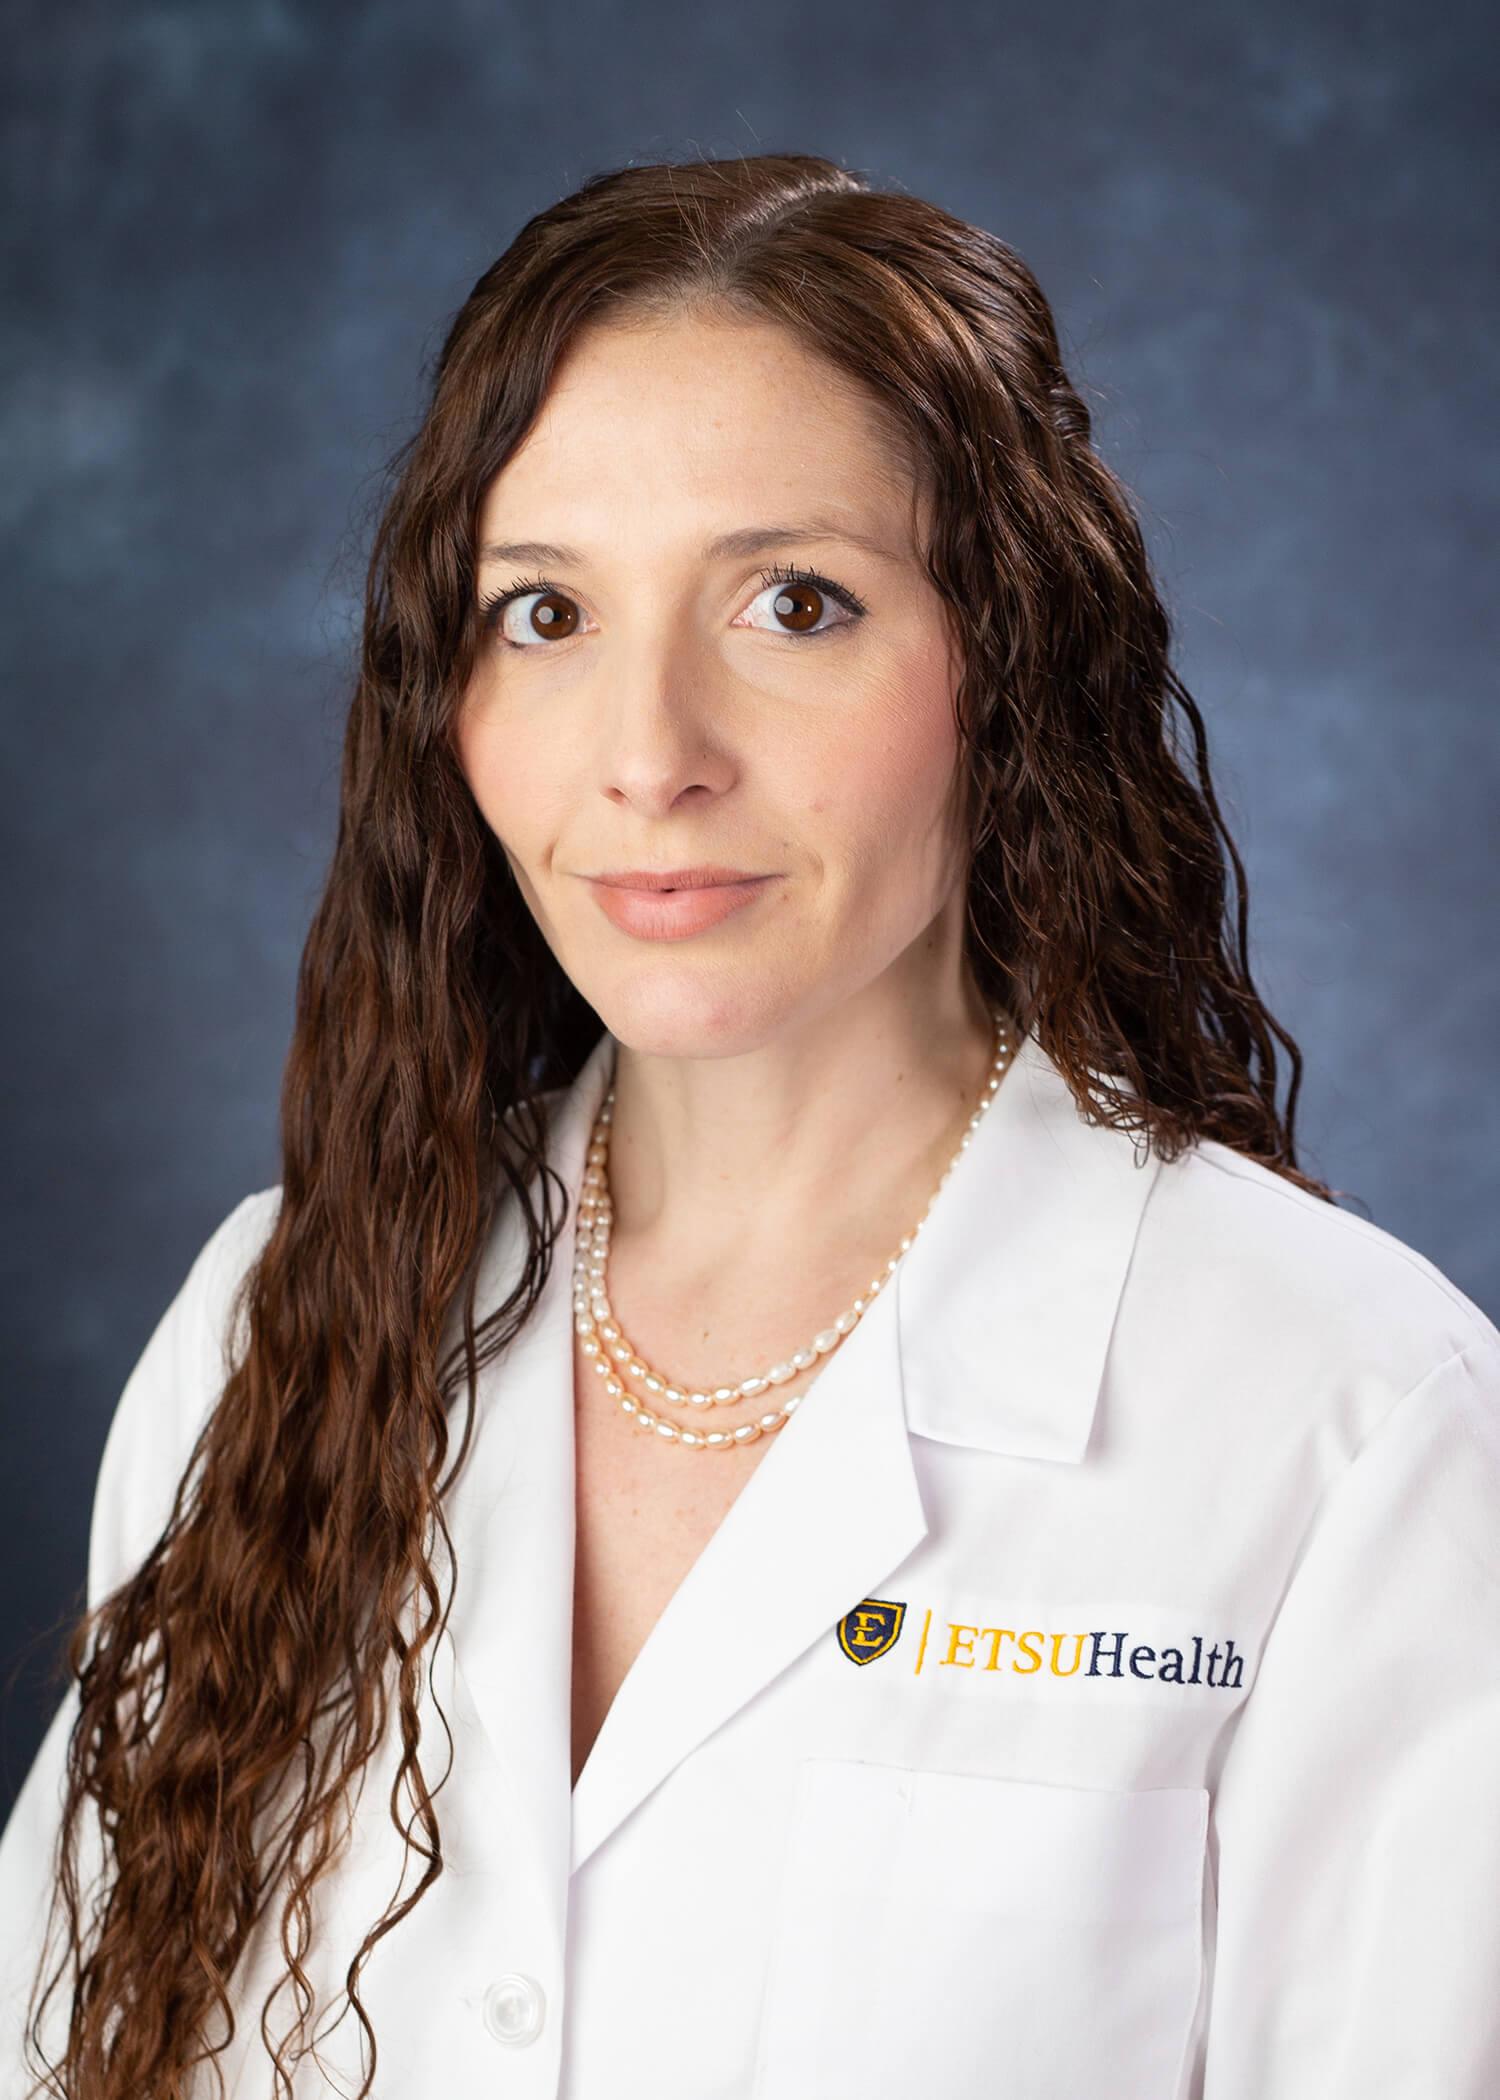 Photo of Natalie Michels, PhD, ALS (AAB)